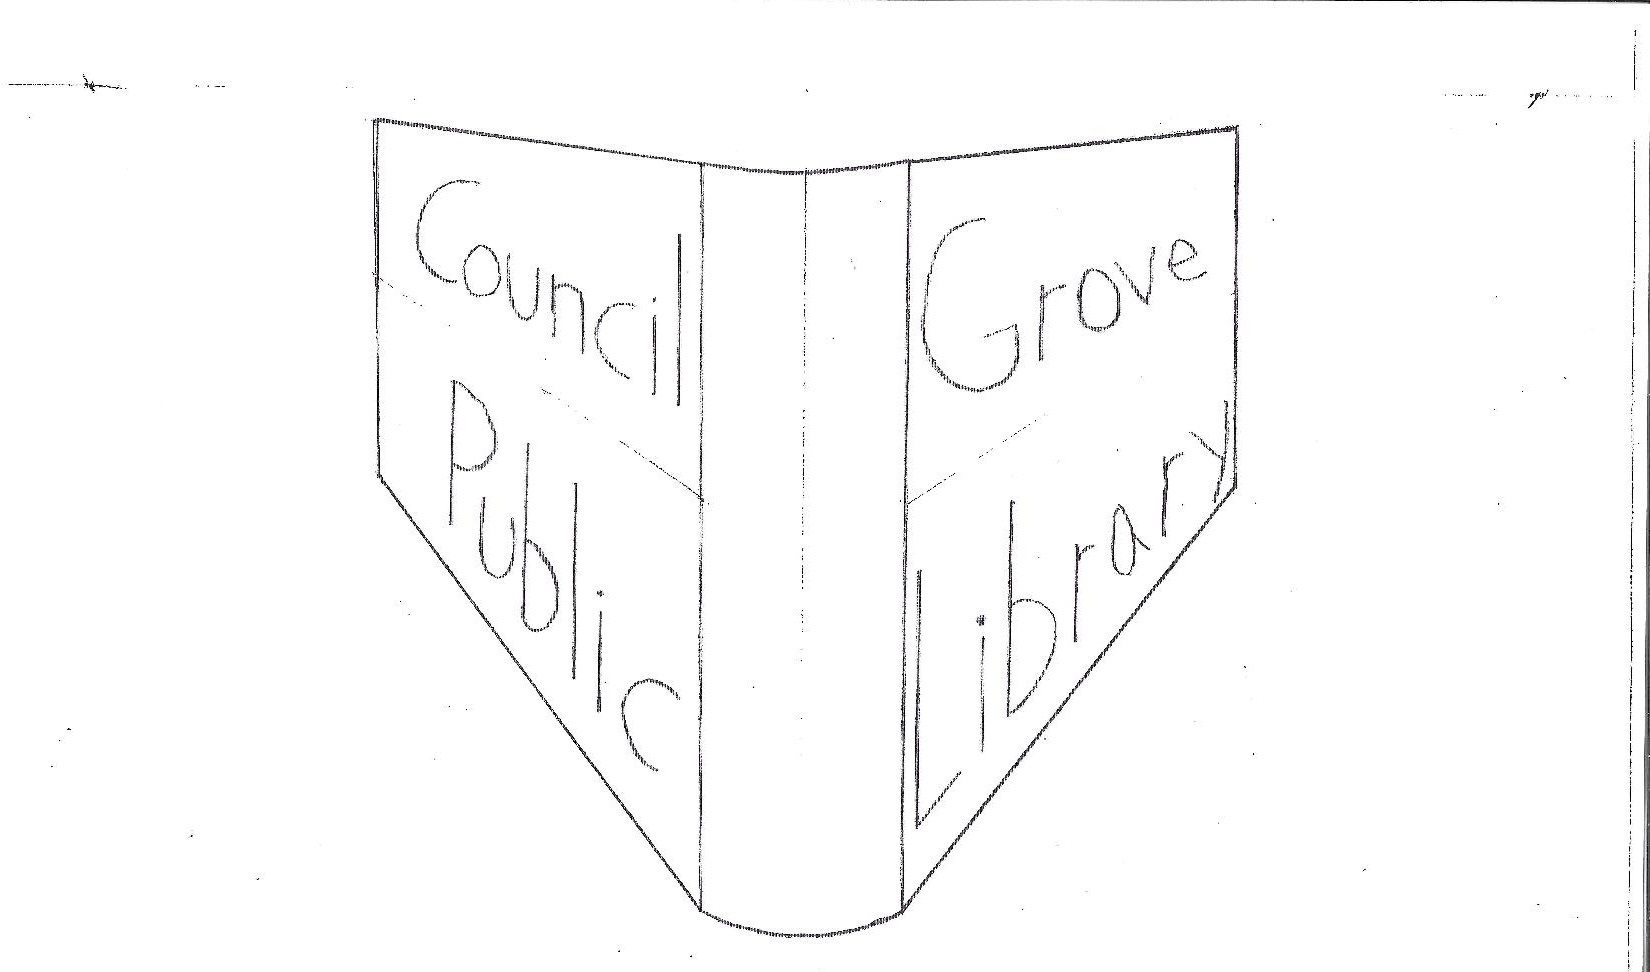 logo-1-page-001